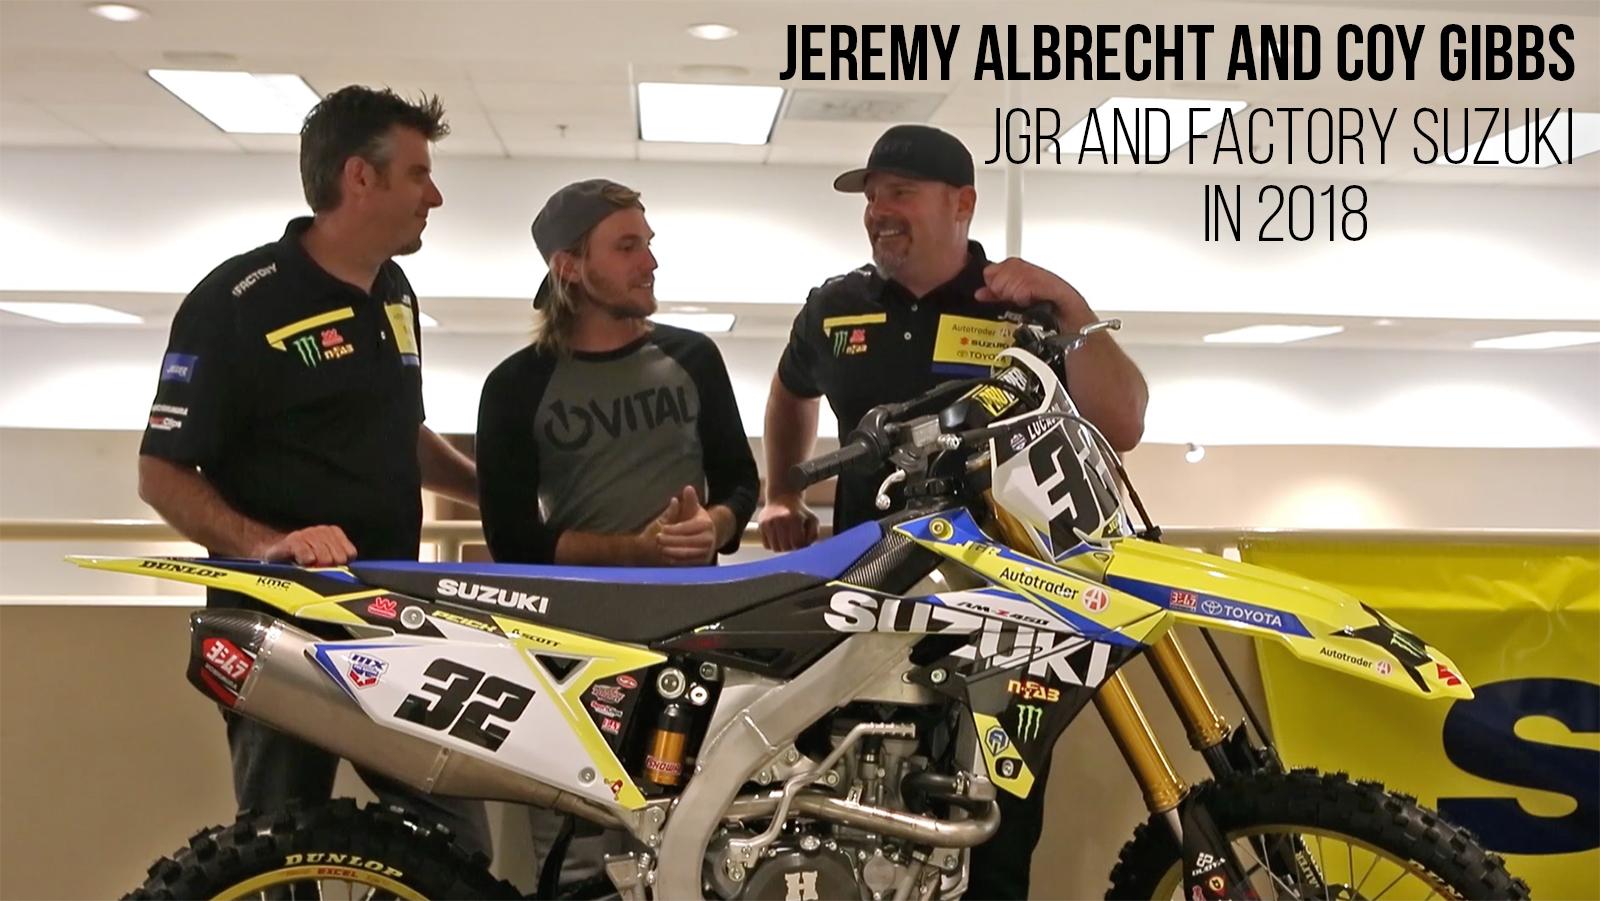 2018 suzuki rmz 250.  250 jeremy albrecht and coy gibbs on jgr factory suzuki in 2018  motocross  videos vital mx intended suzuki rmz 250